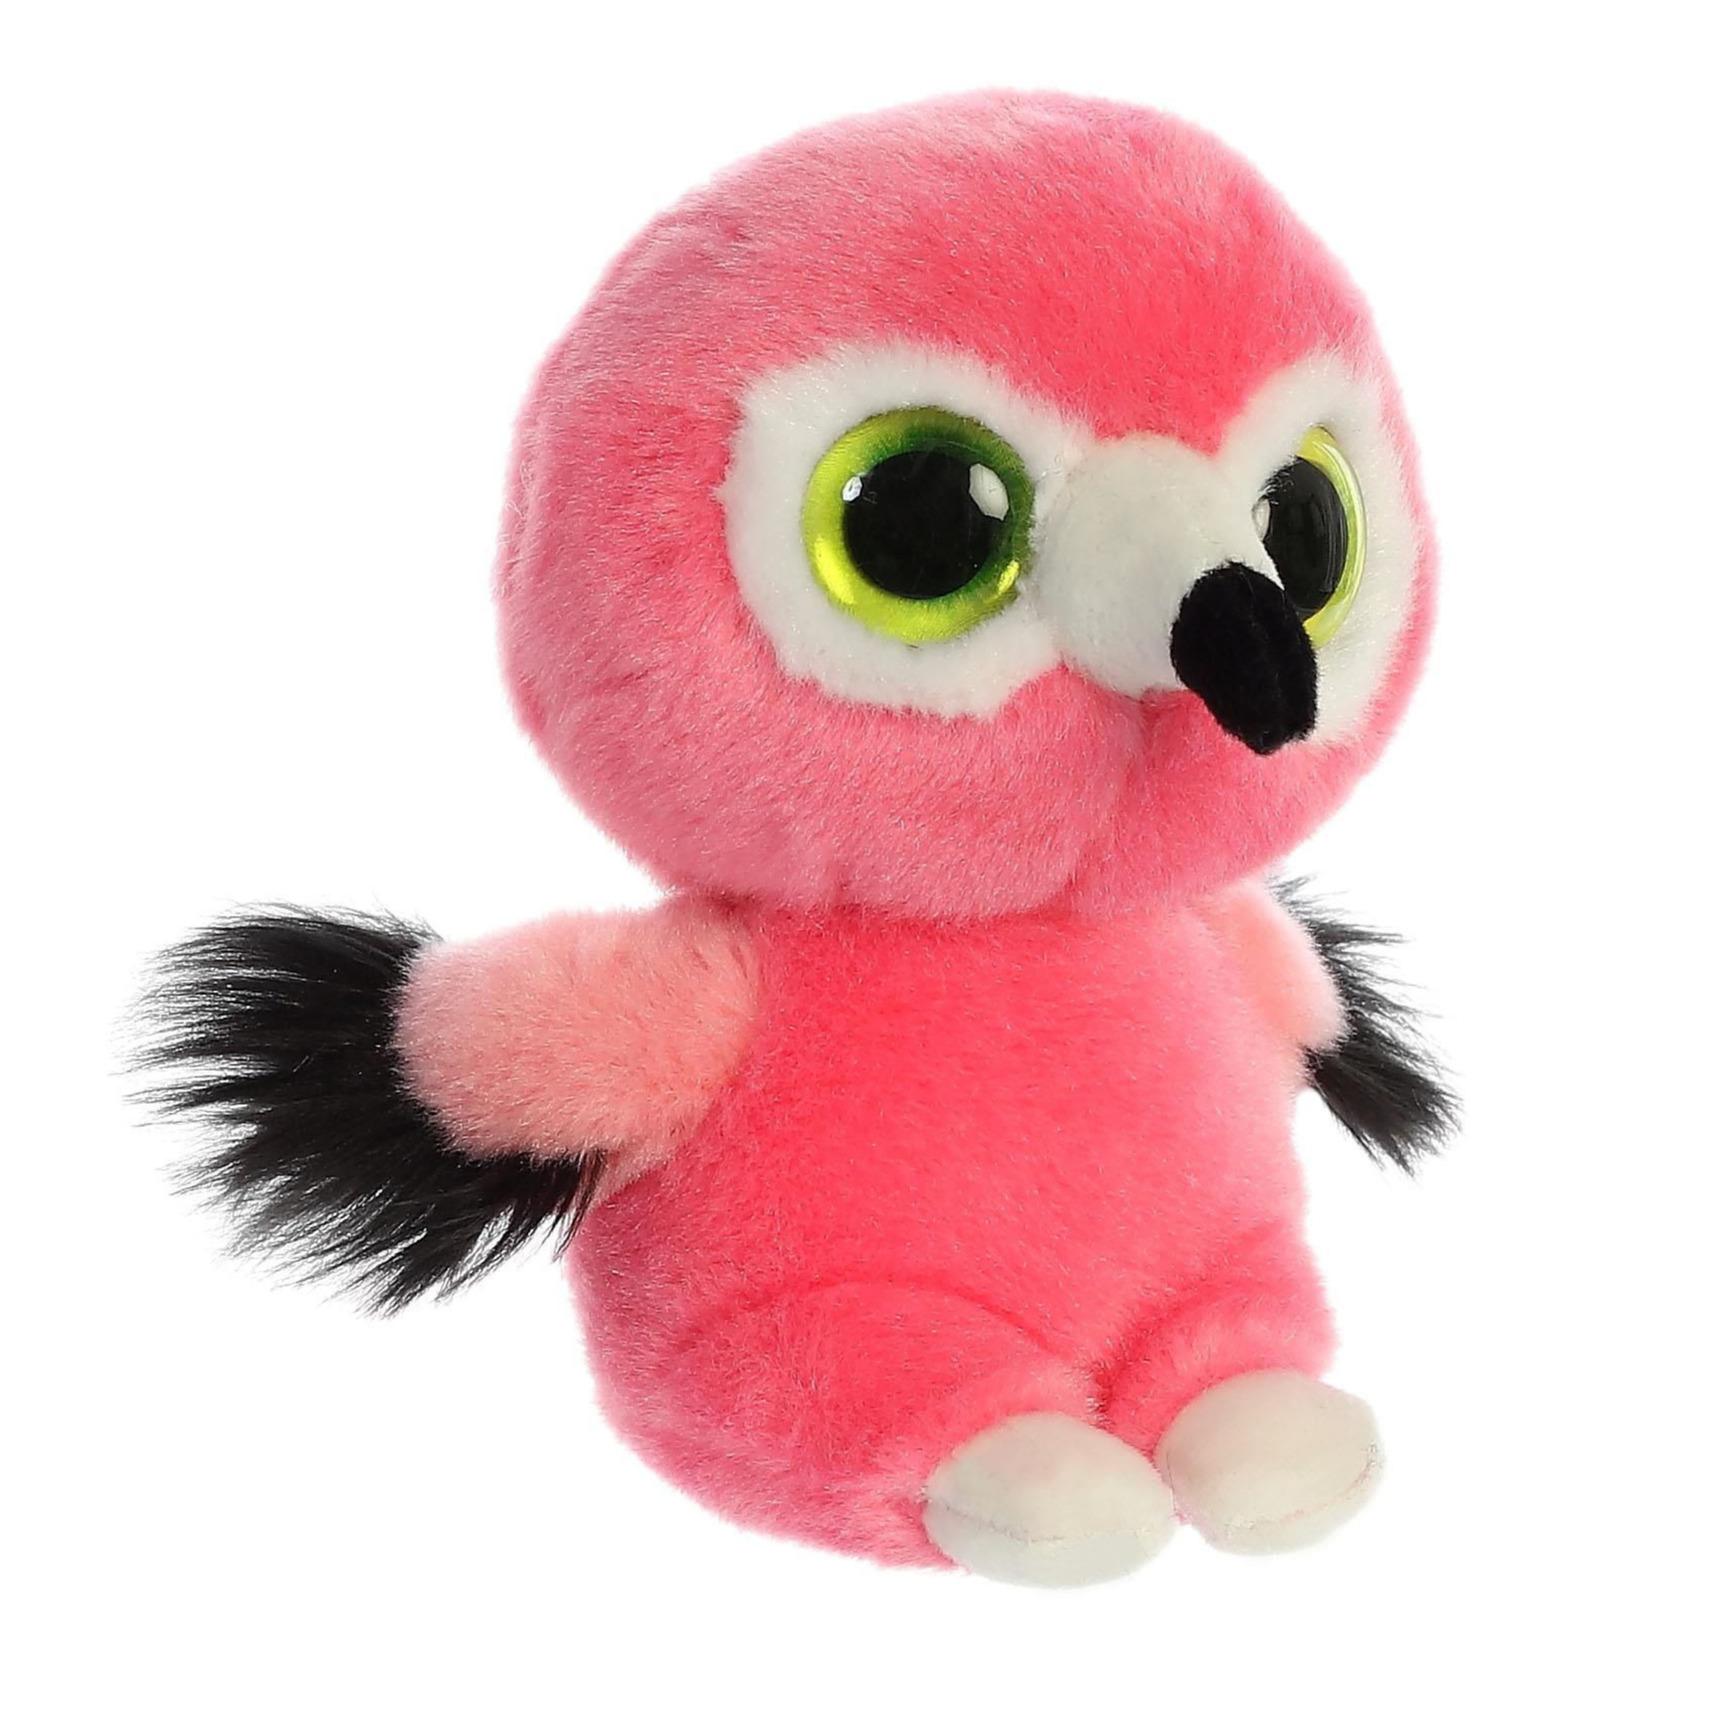 Pluche flamingo knuffel 15 cm